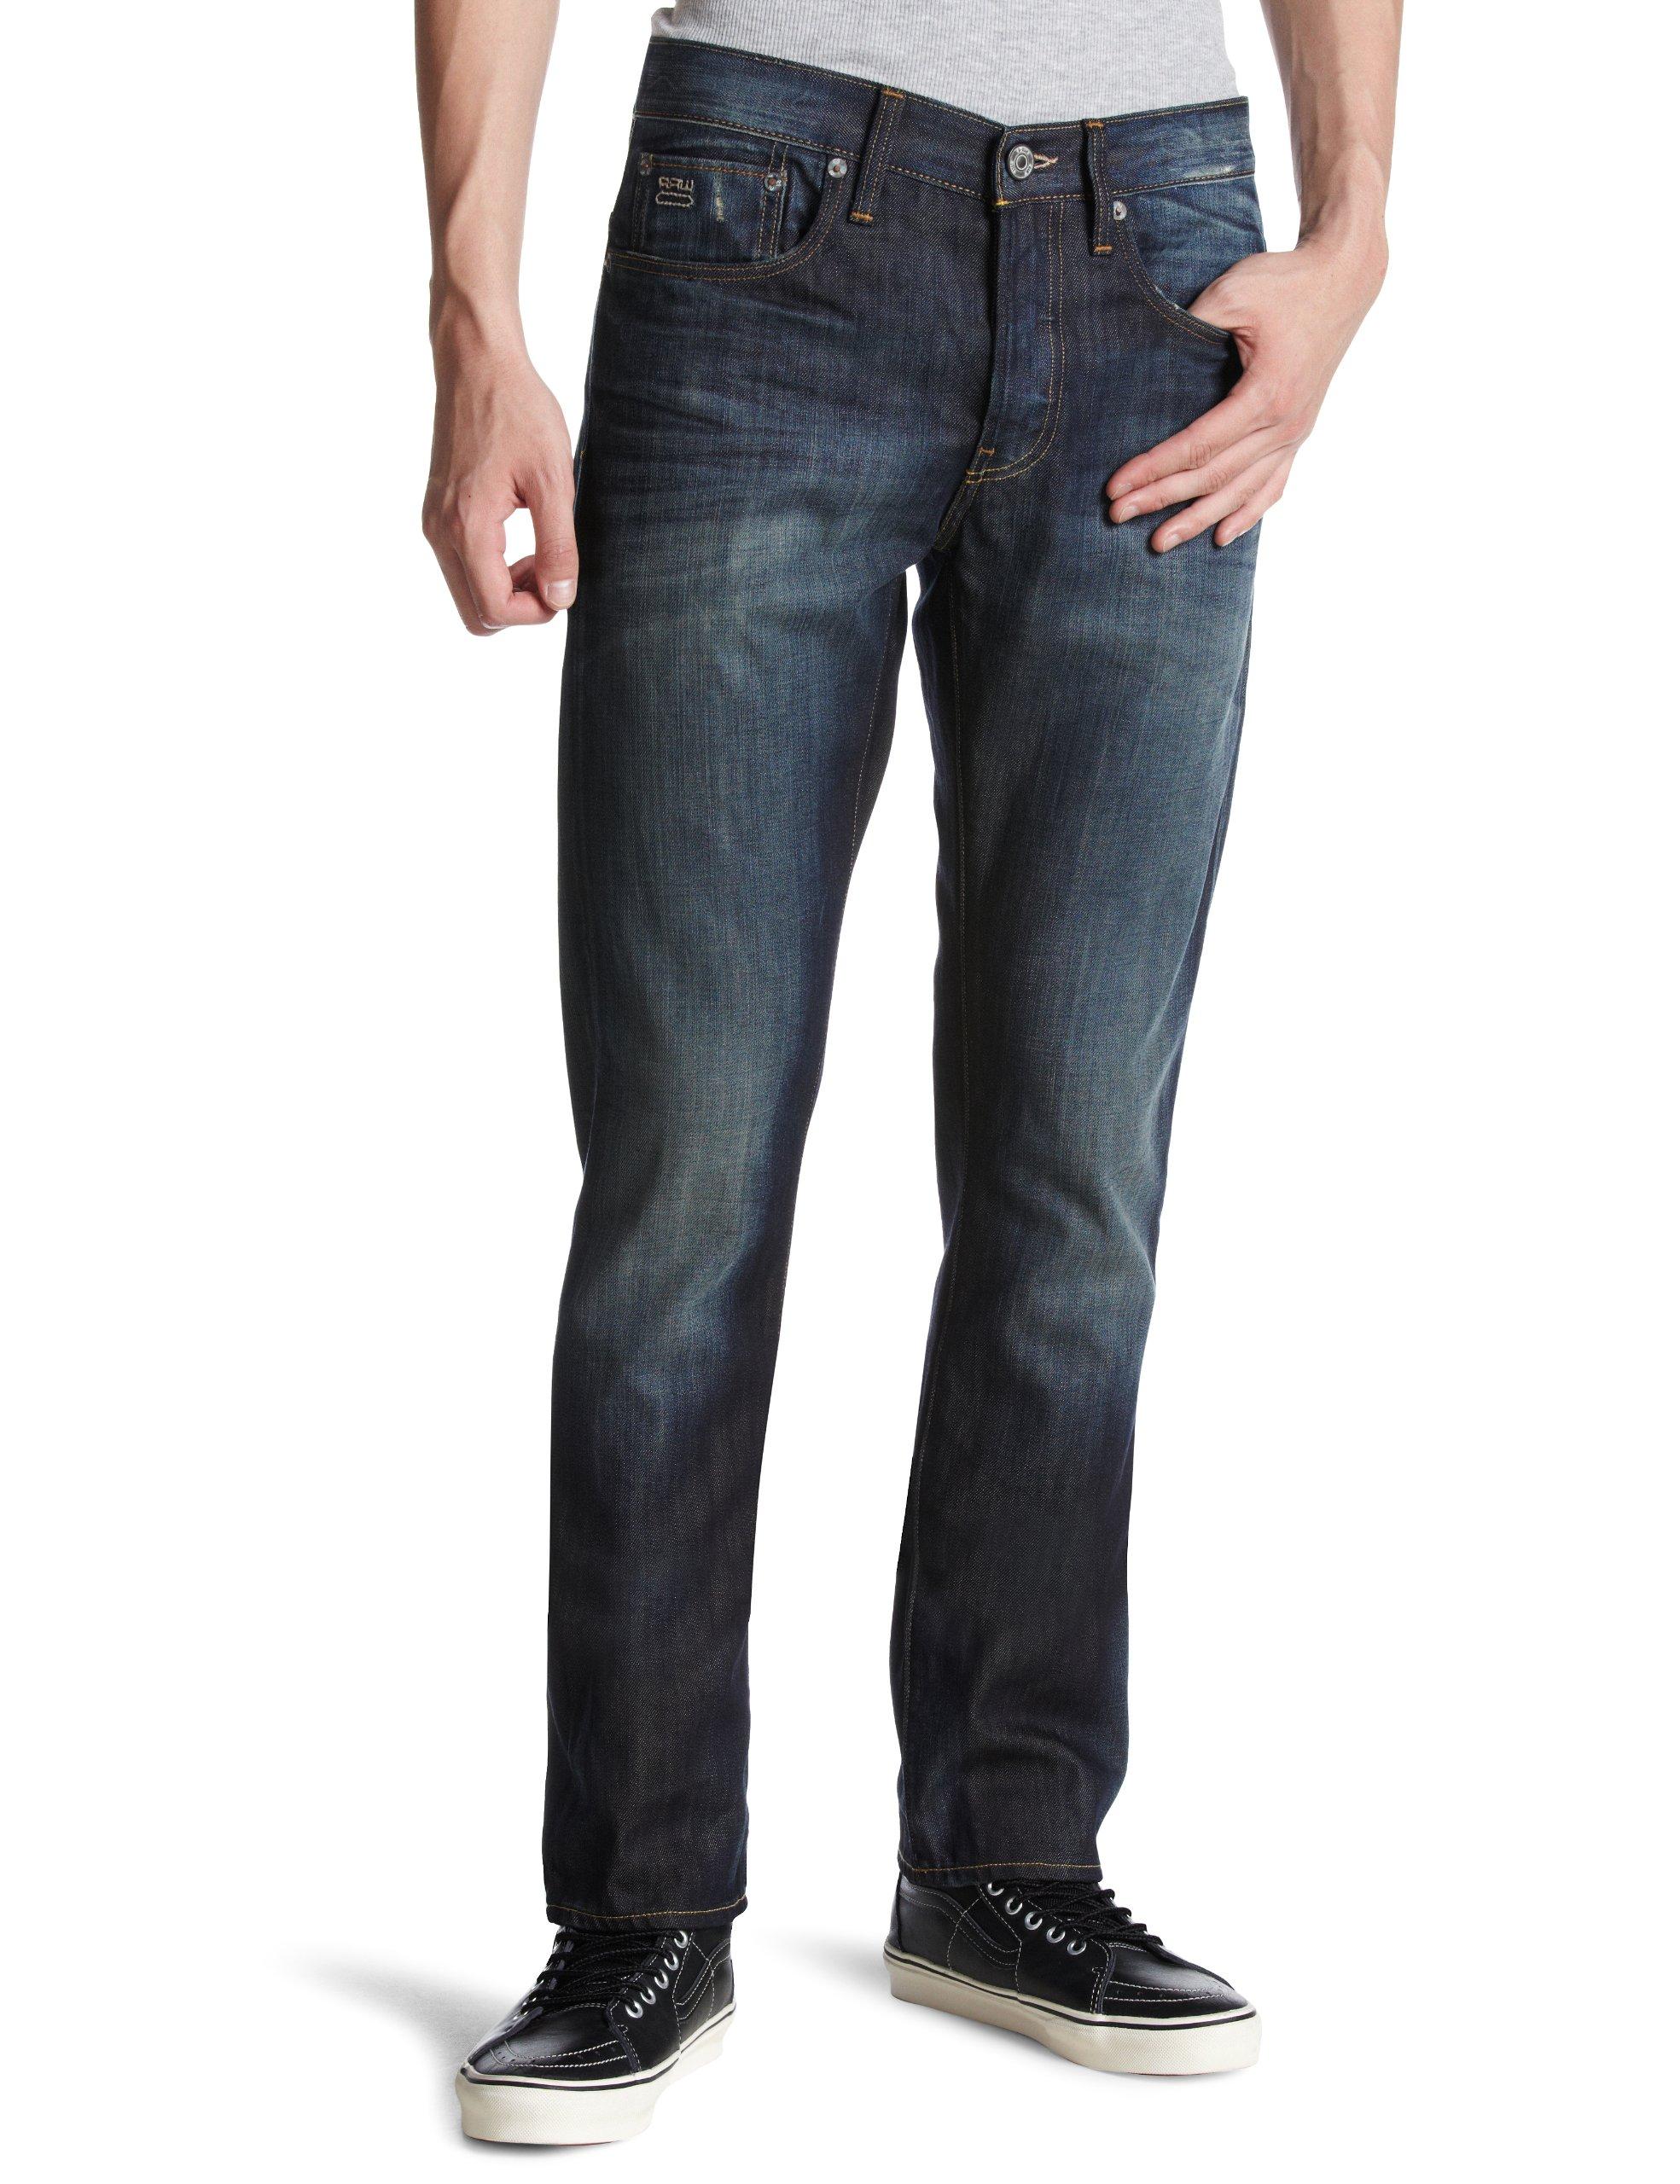 G-star Raw 3301 Slim Mens Jeans 50127 Pants (waist 33 leg 30, vintage aged 2886.1368)